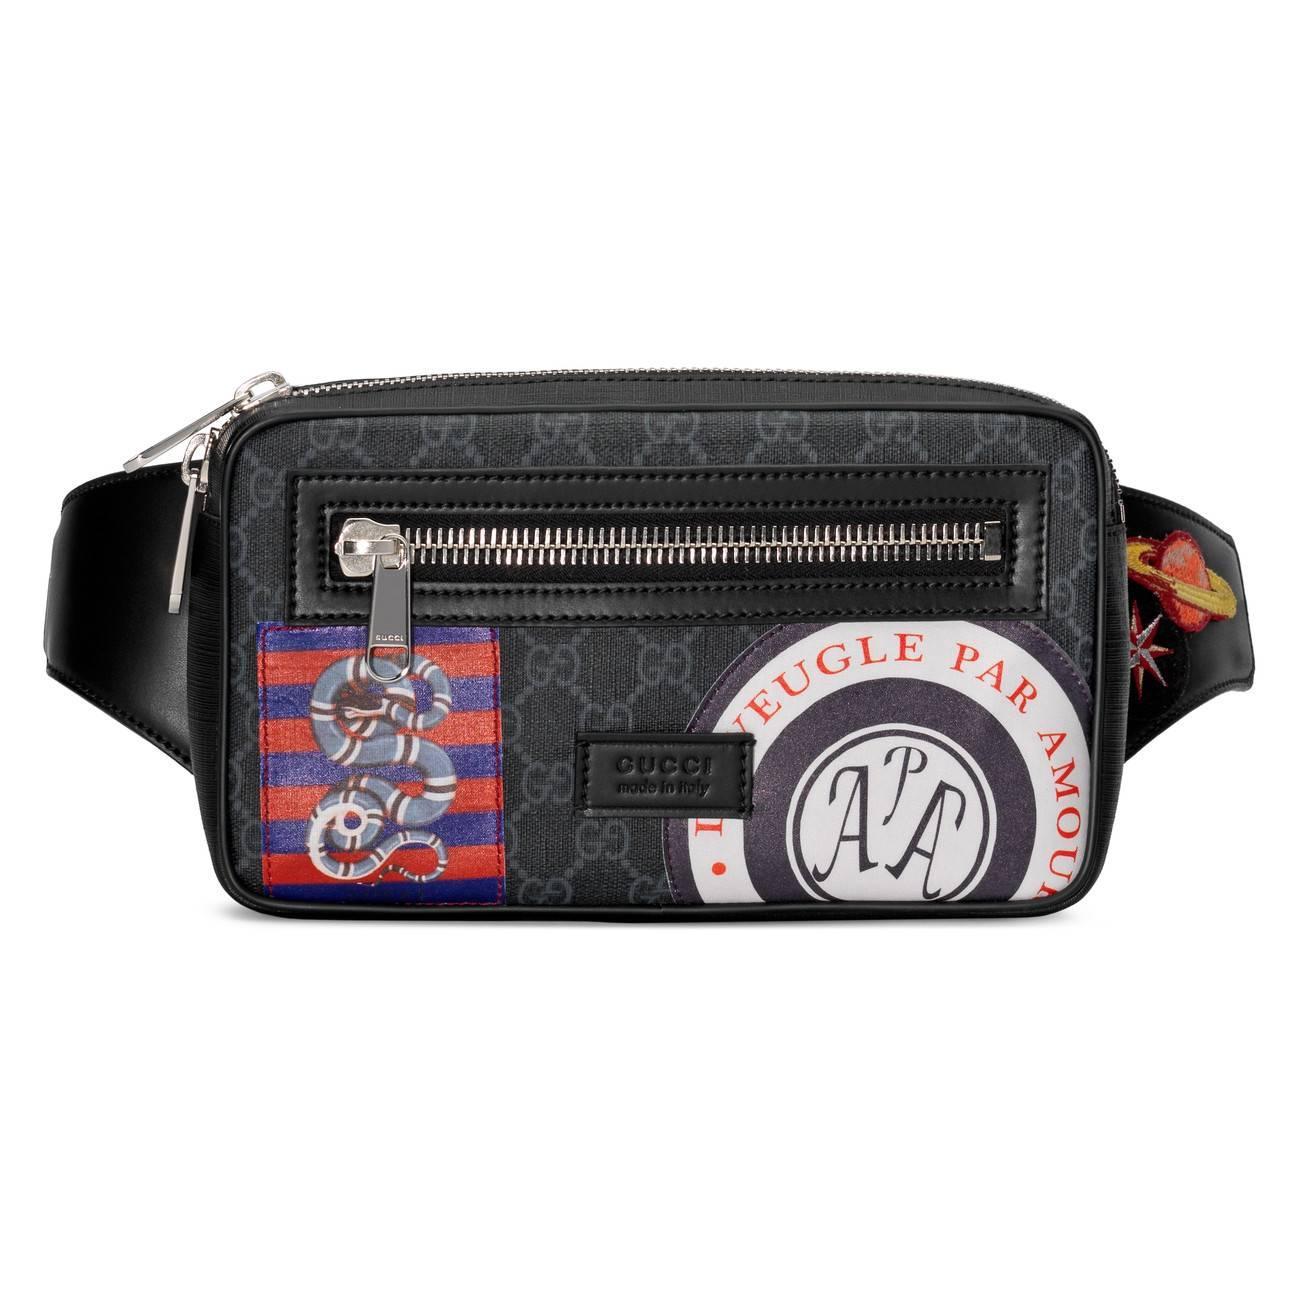 59eb943e8 Gucci Night Courrier Soft GG Supreme Belt Bag in Black for Men - Lyst